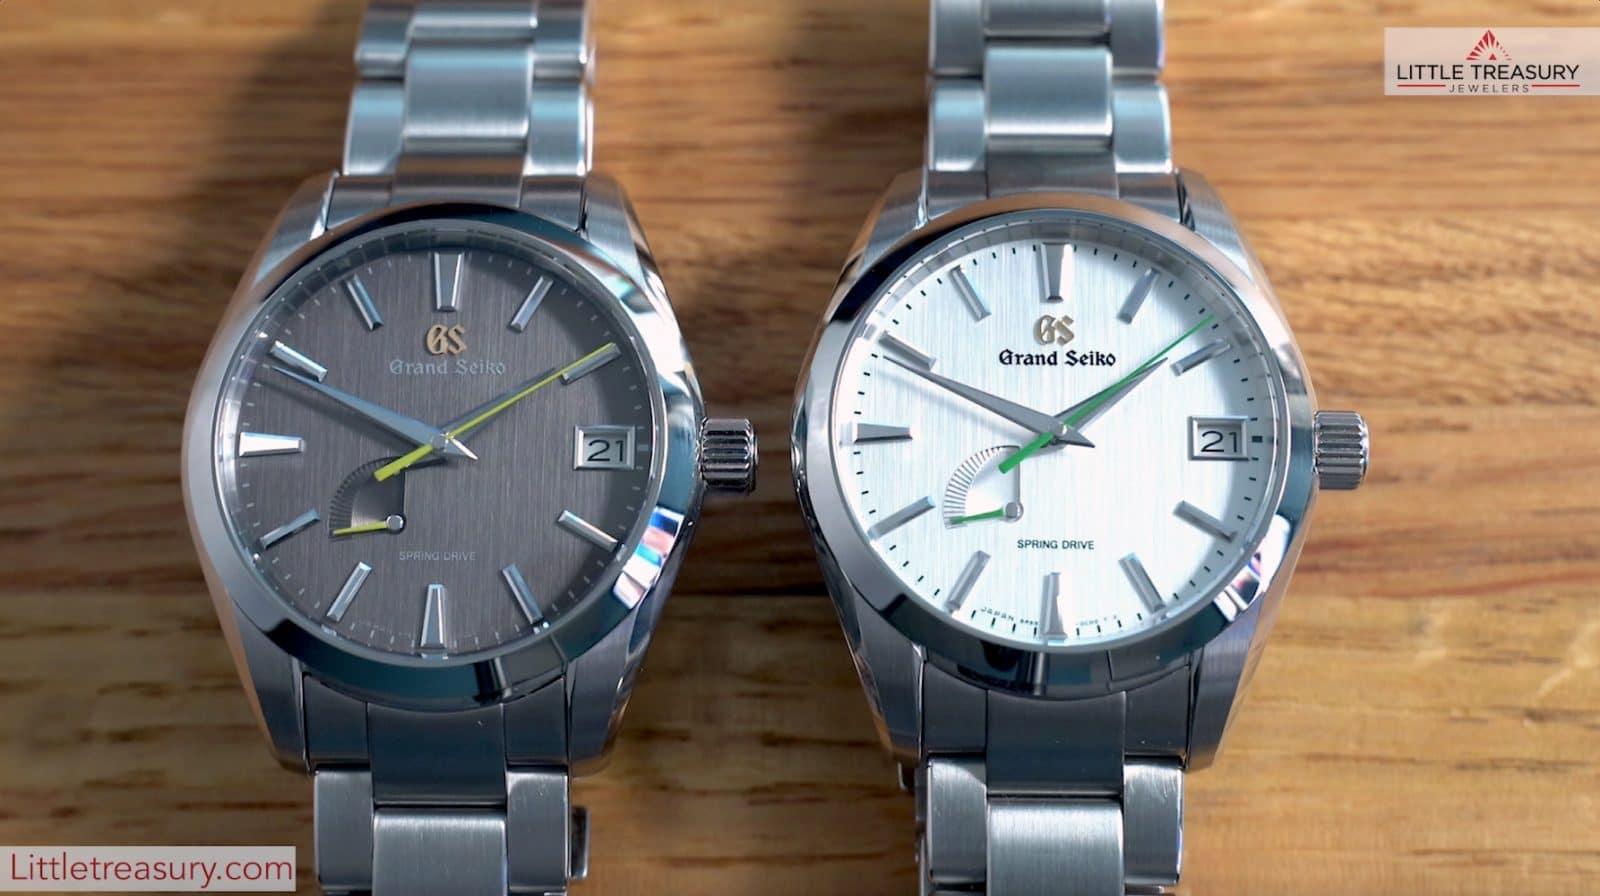 Grand Seiko Soko Watches